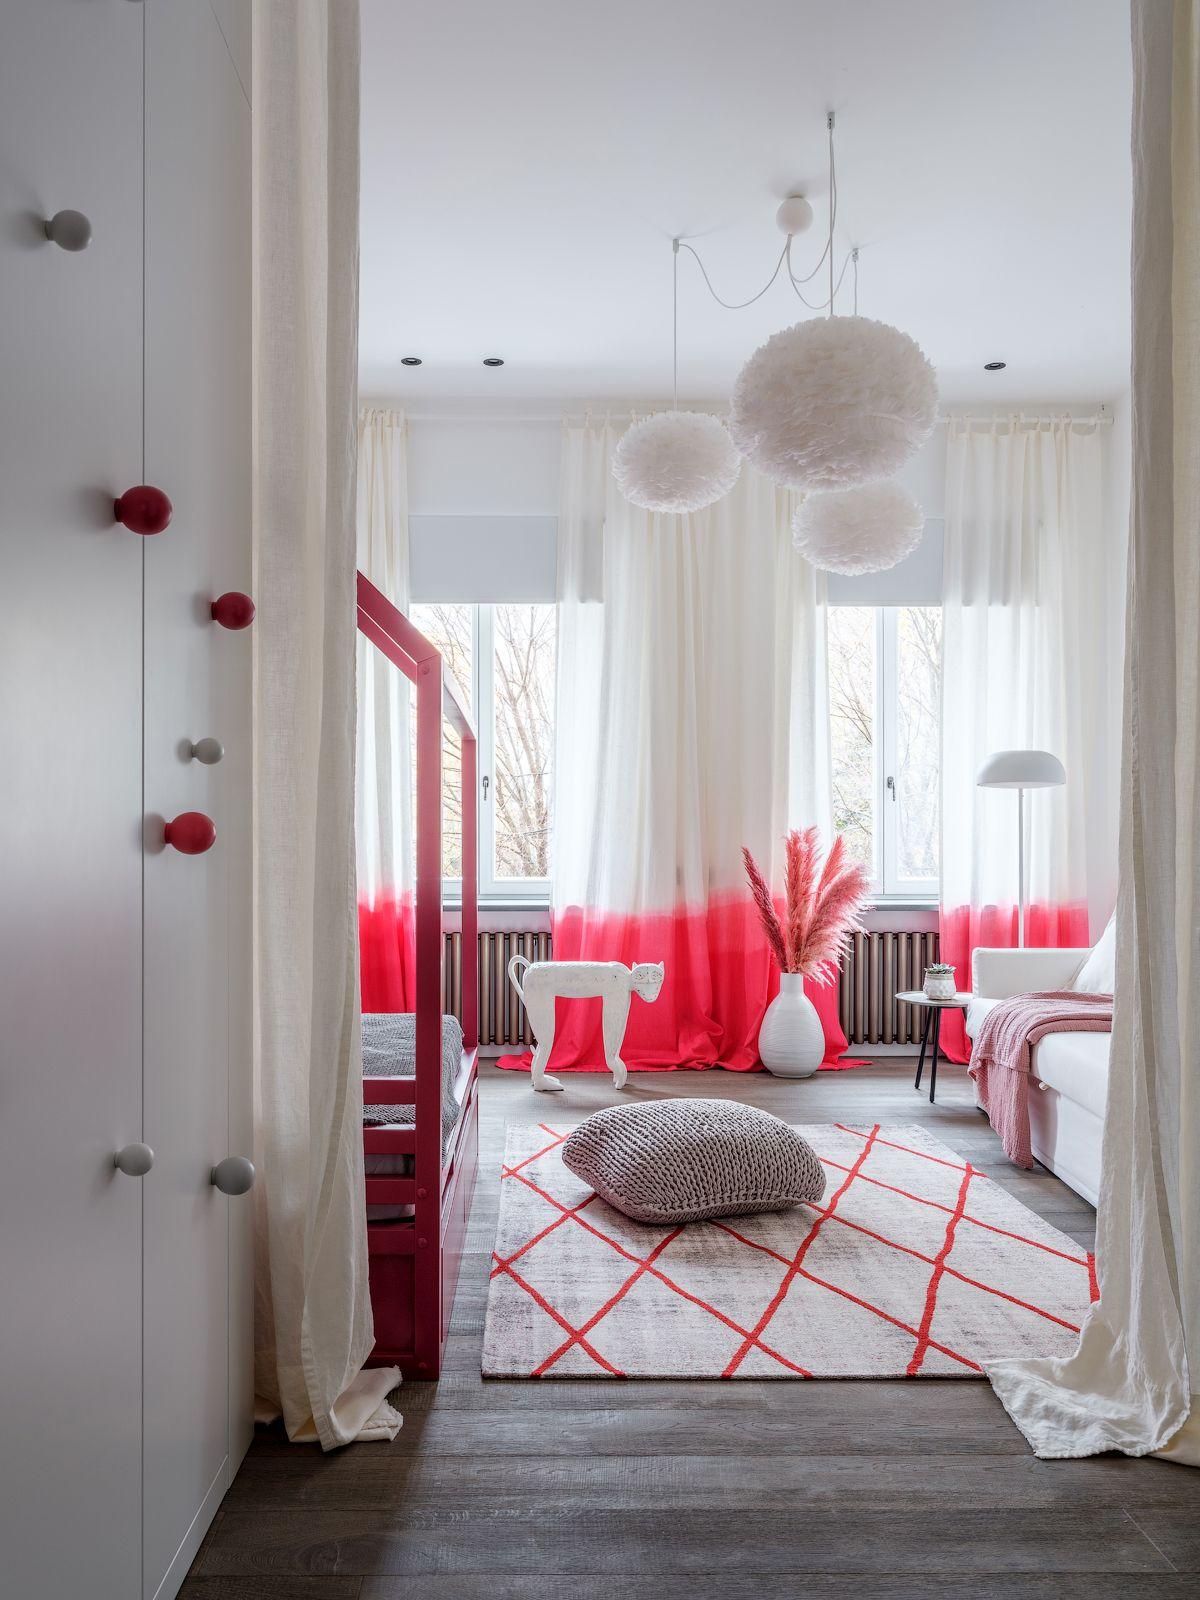 adelaparvu.com despre apartament 90 mp, design Minina Design, Foto Mikhail Loskutov (21)